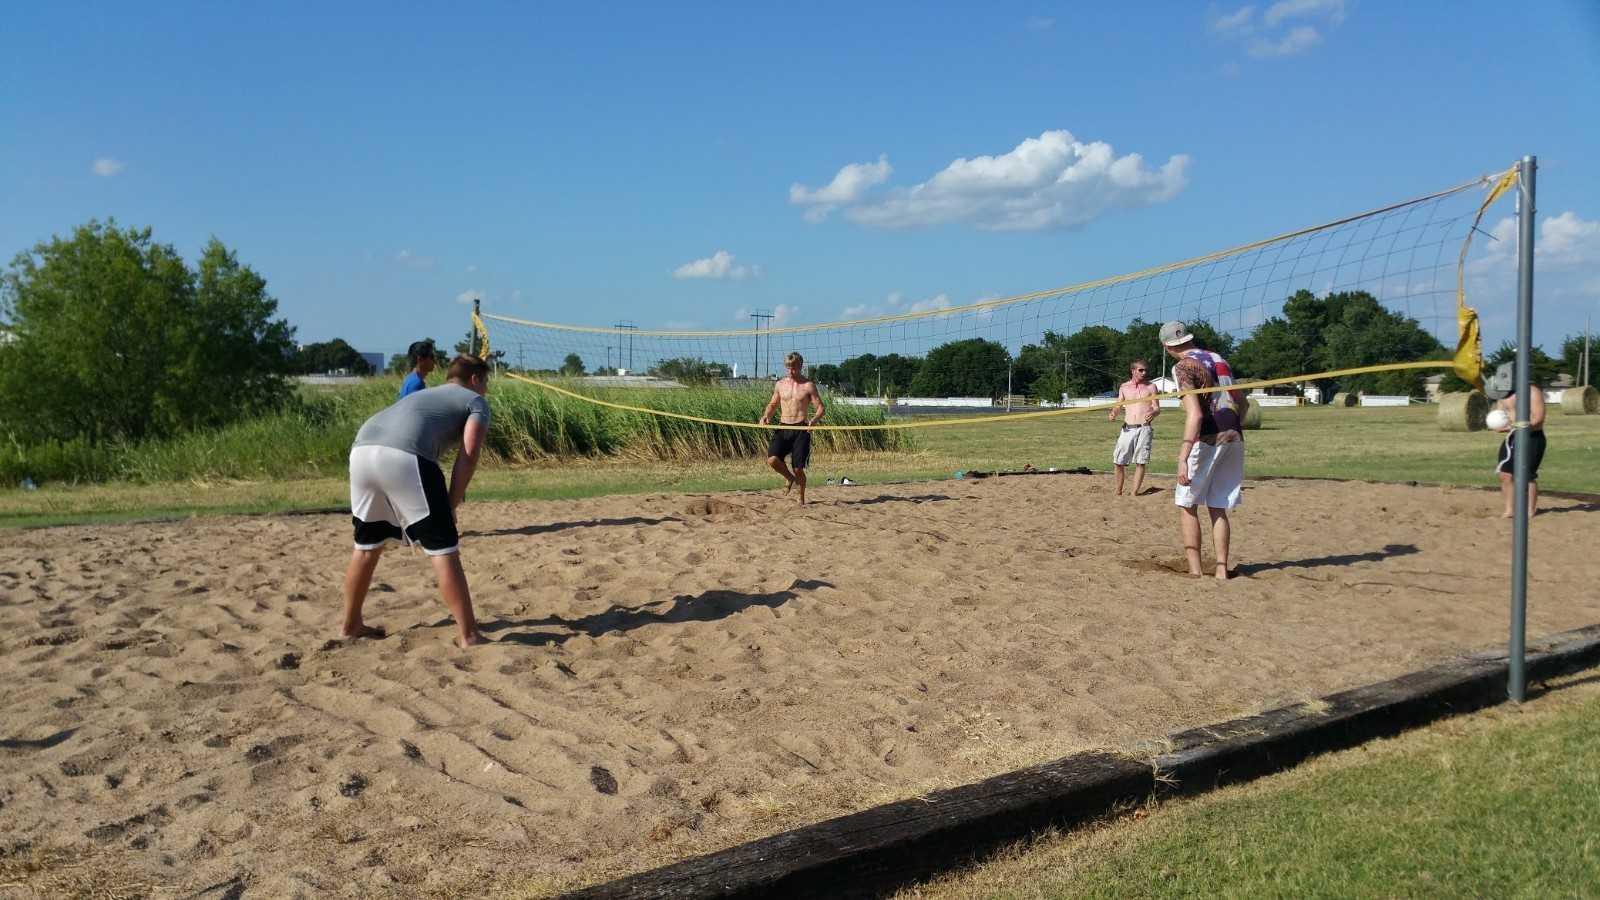 Student Housing Spartan College Volleyball